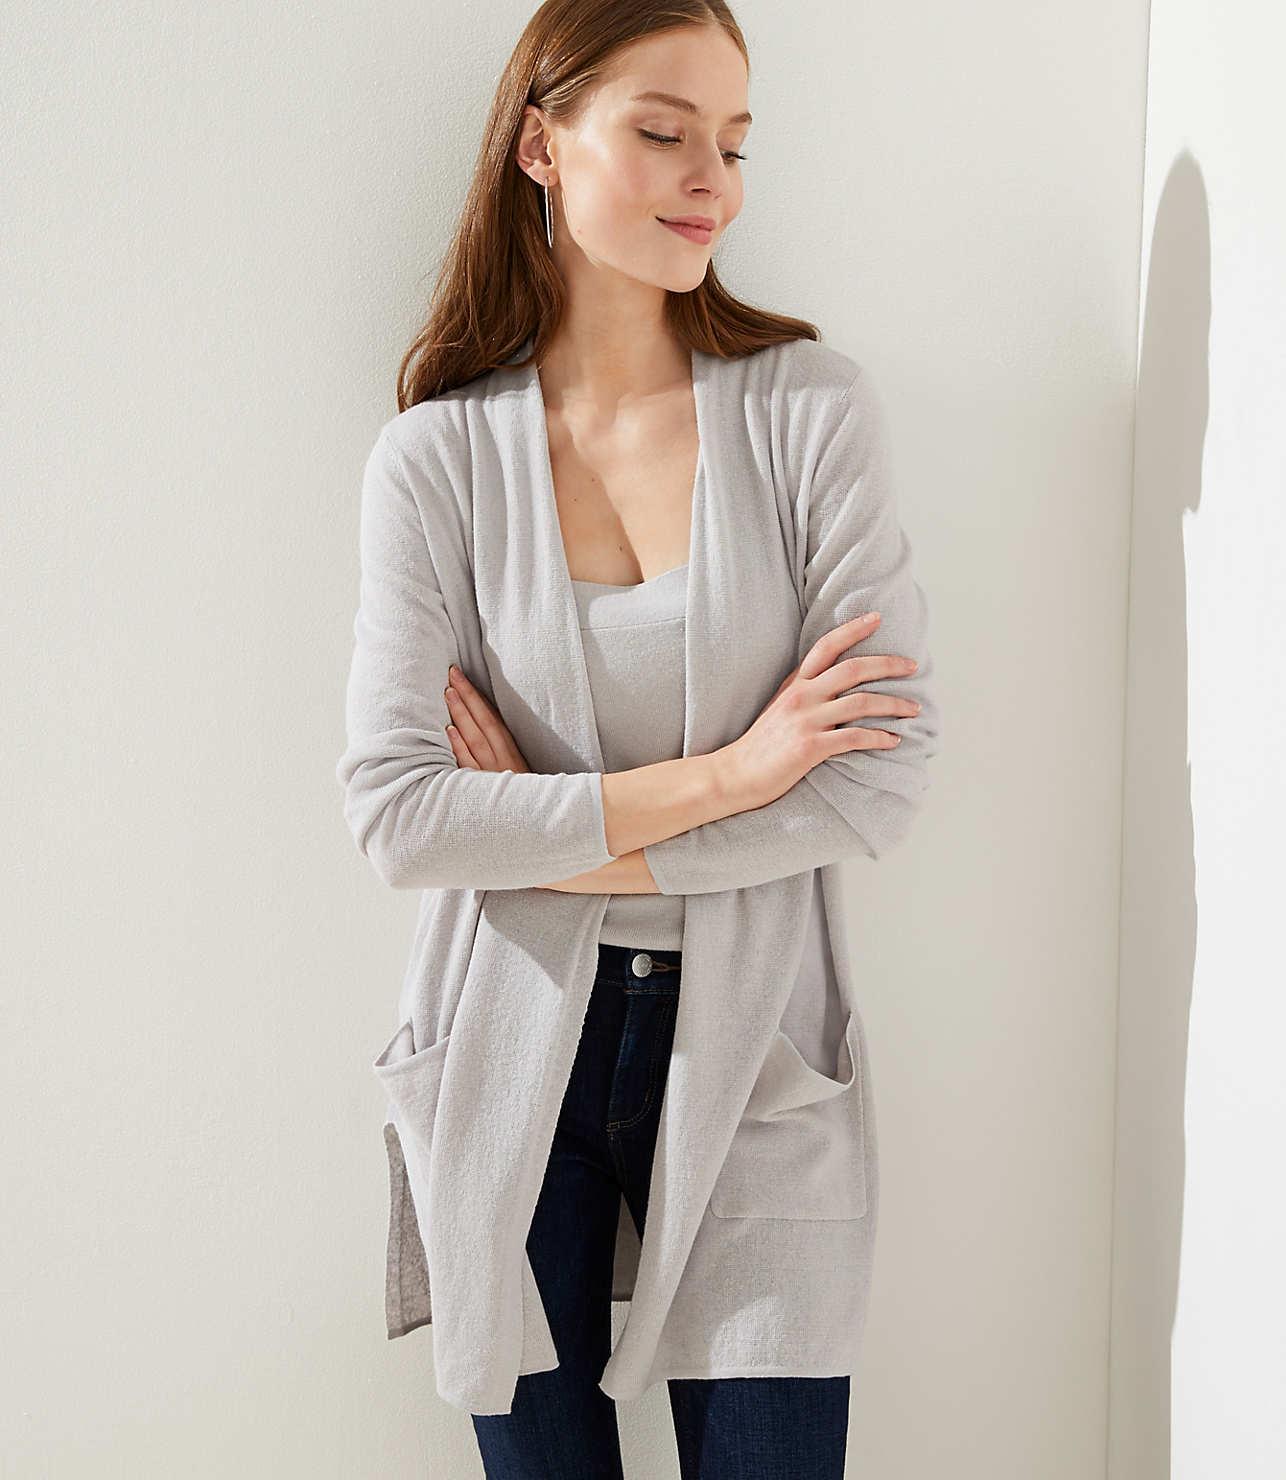 online retailer 5bfe3 1321f Linen Blend Pocket Duster Sweater | LOFT